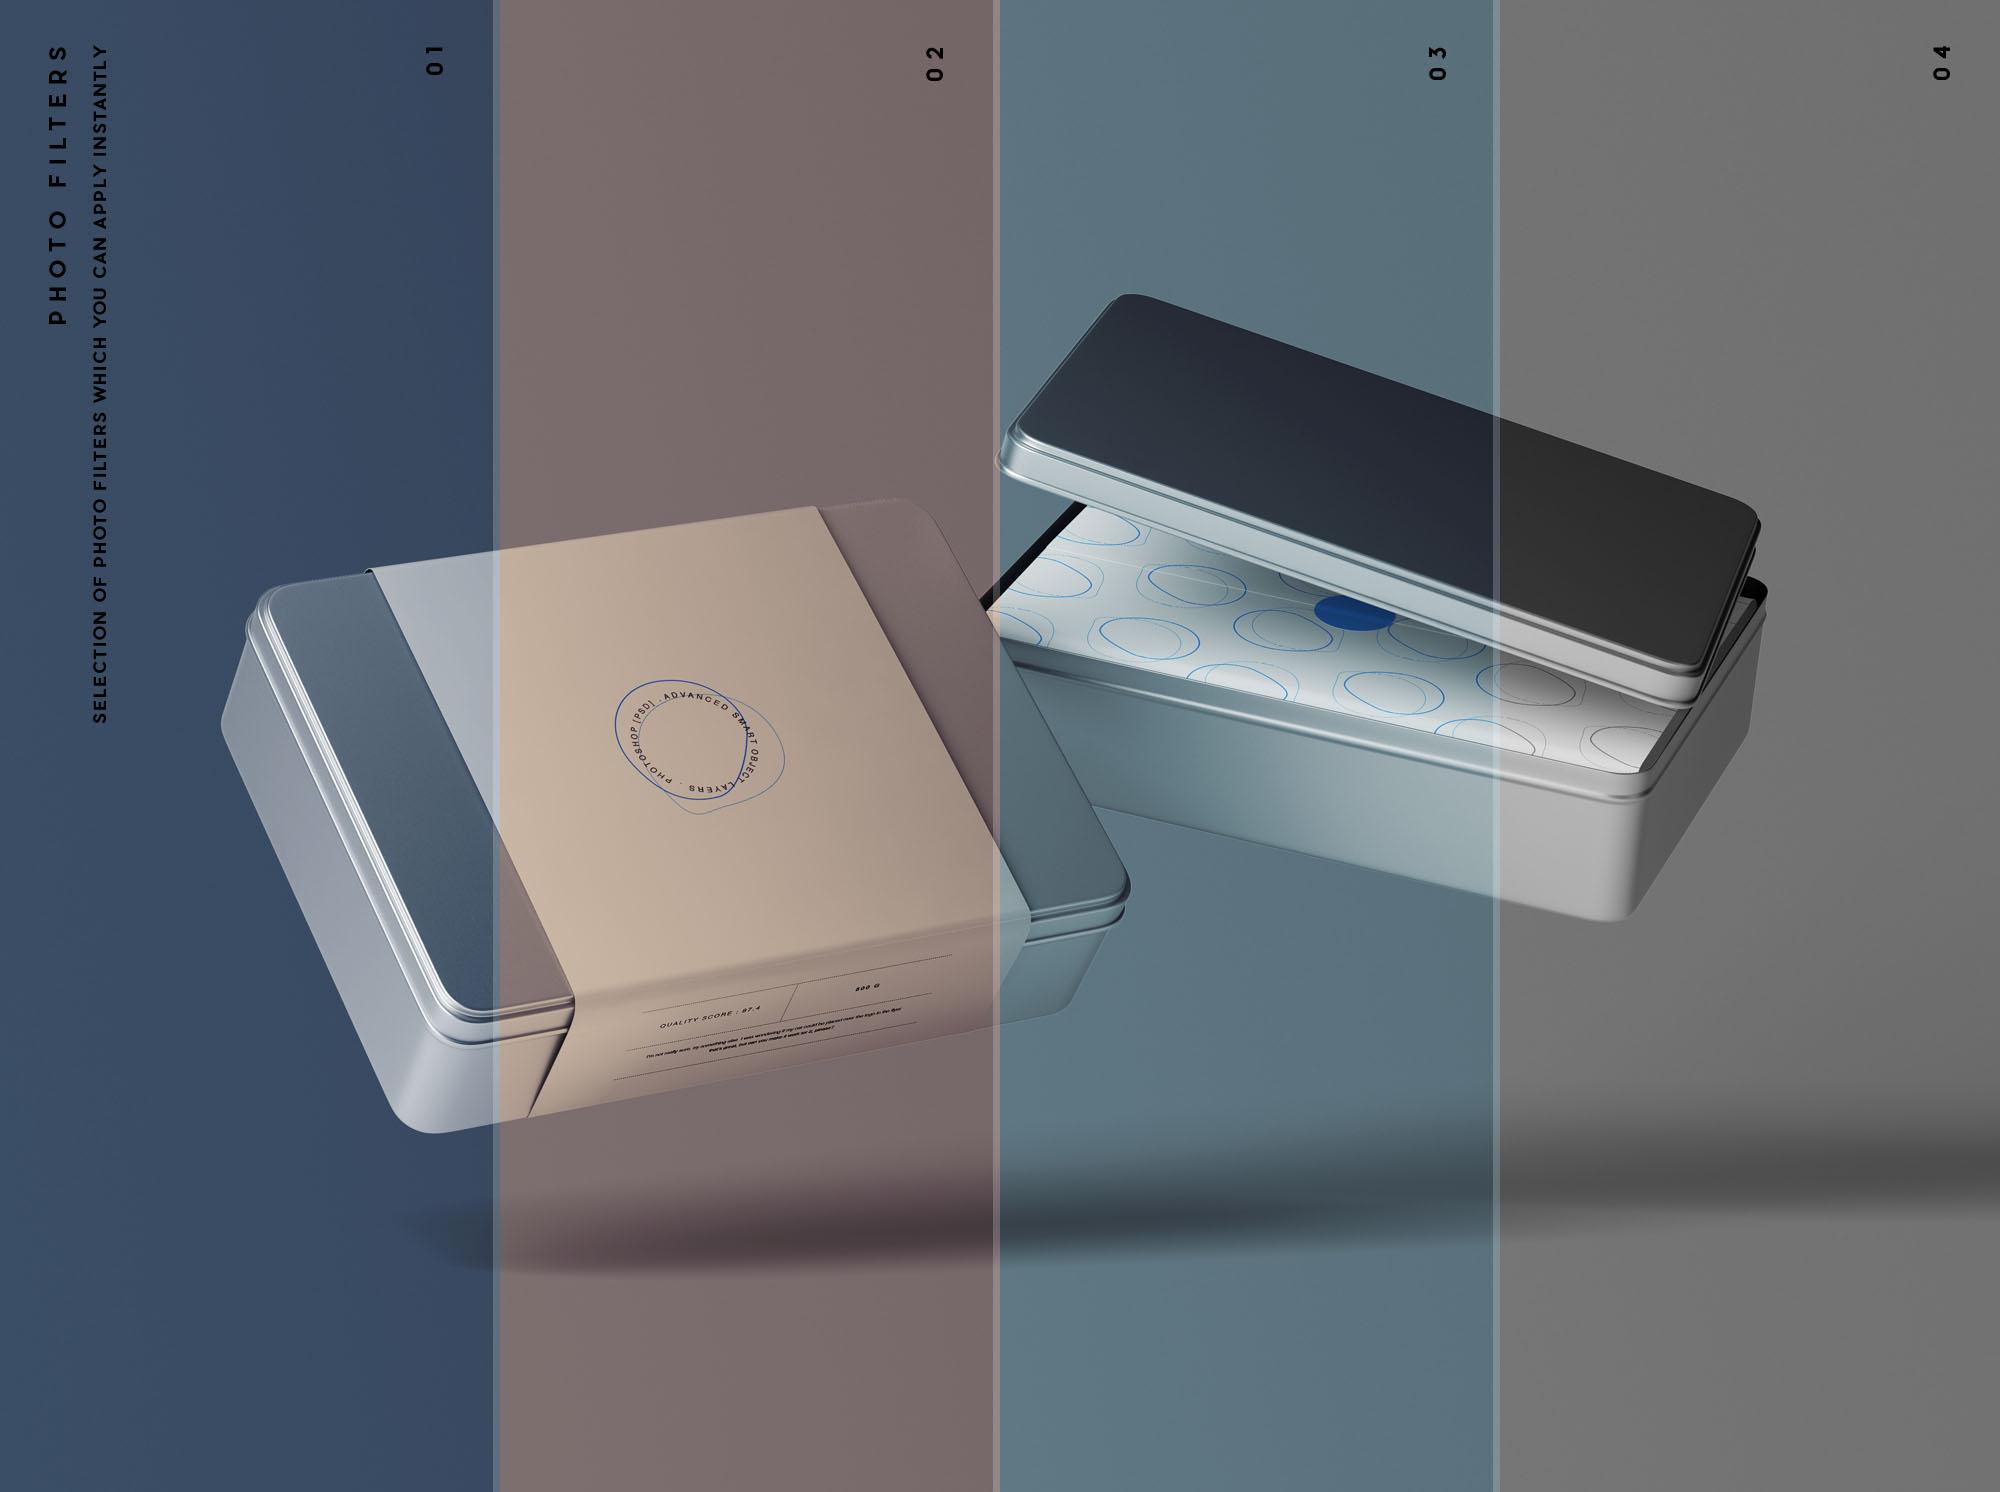 Metal Box Mockup Filters